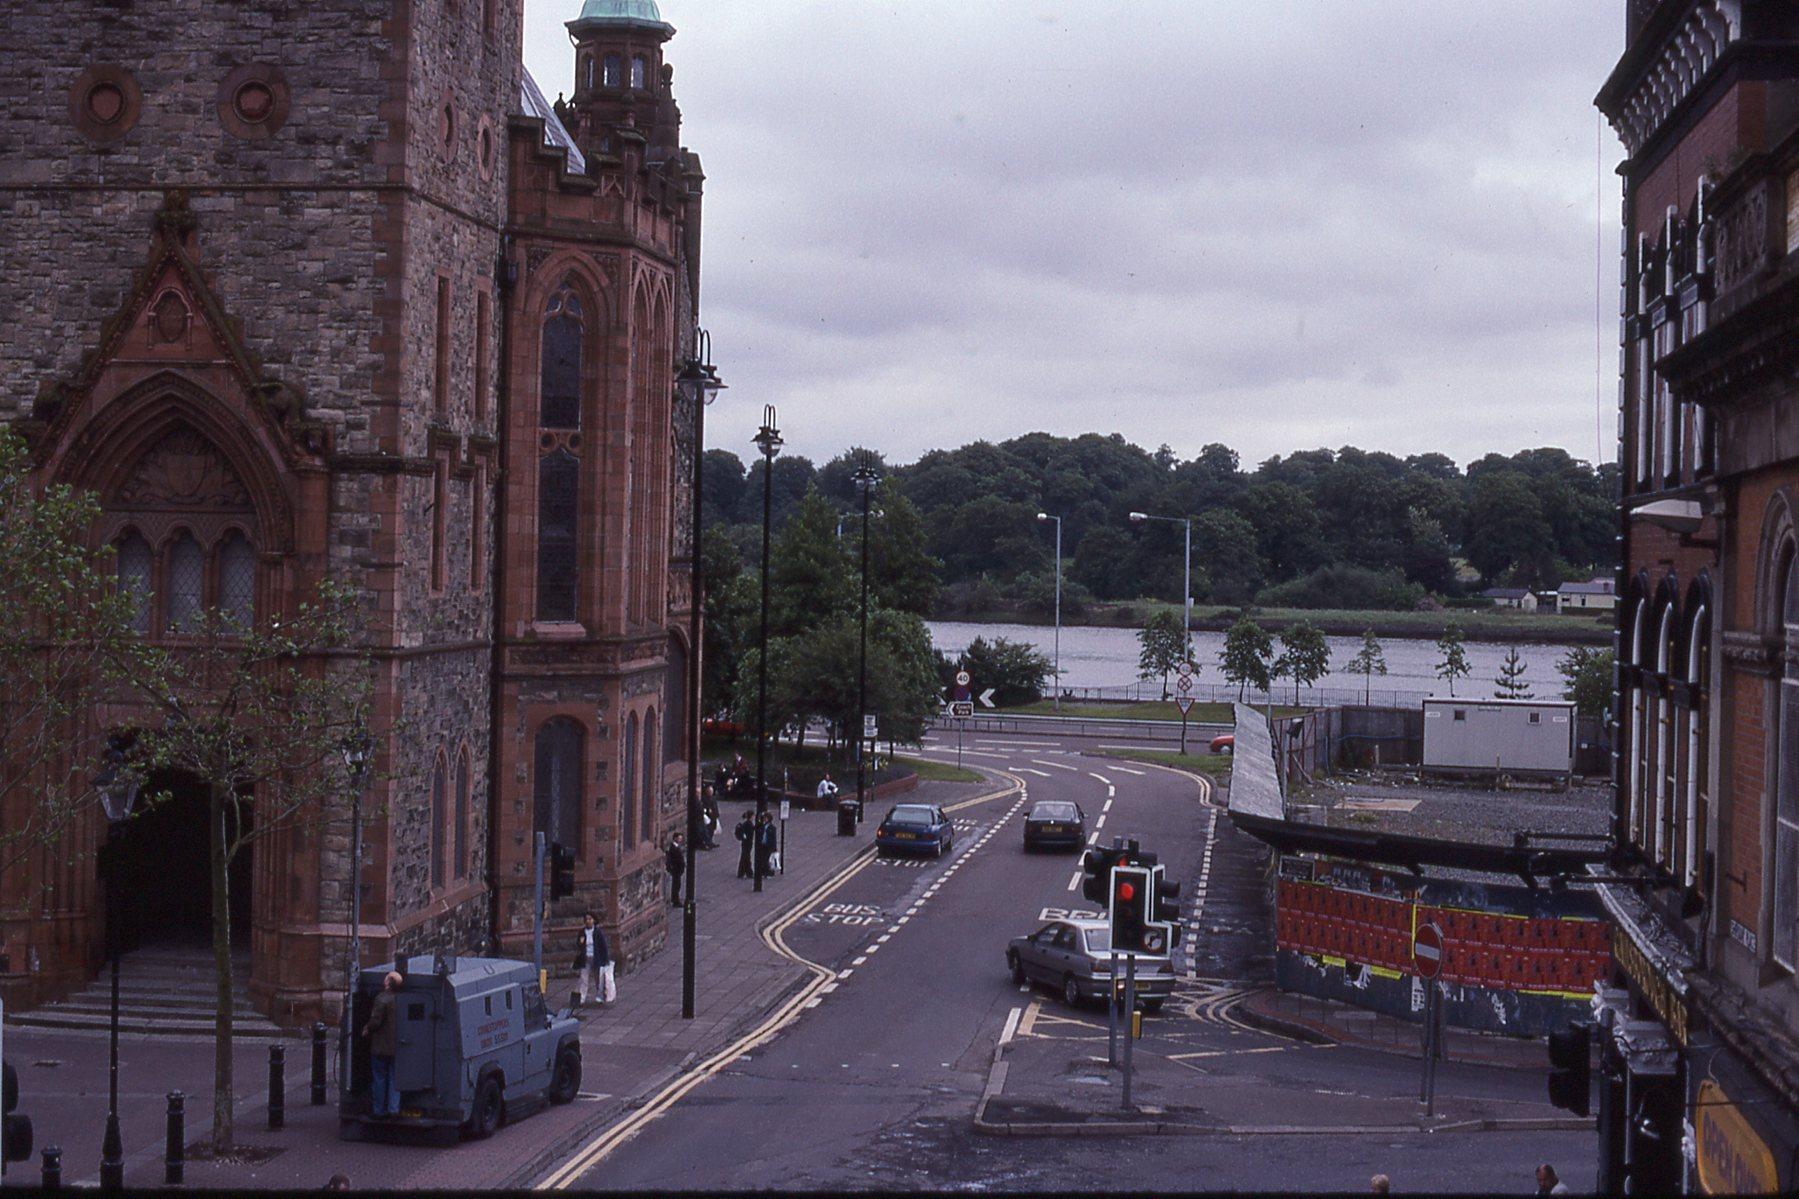 River Foyle in Derry